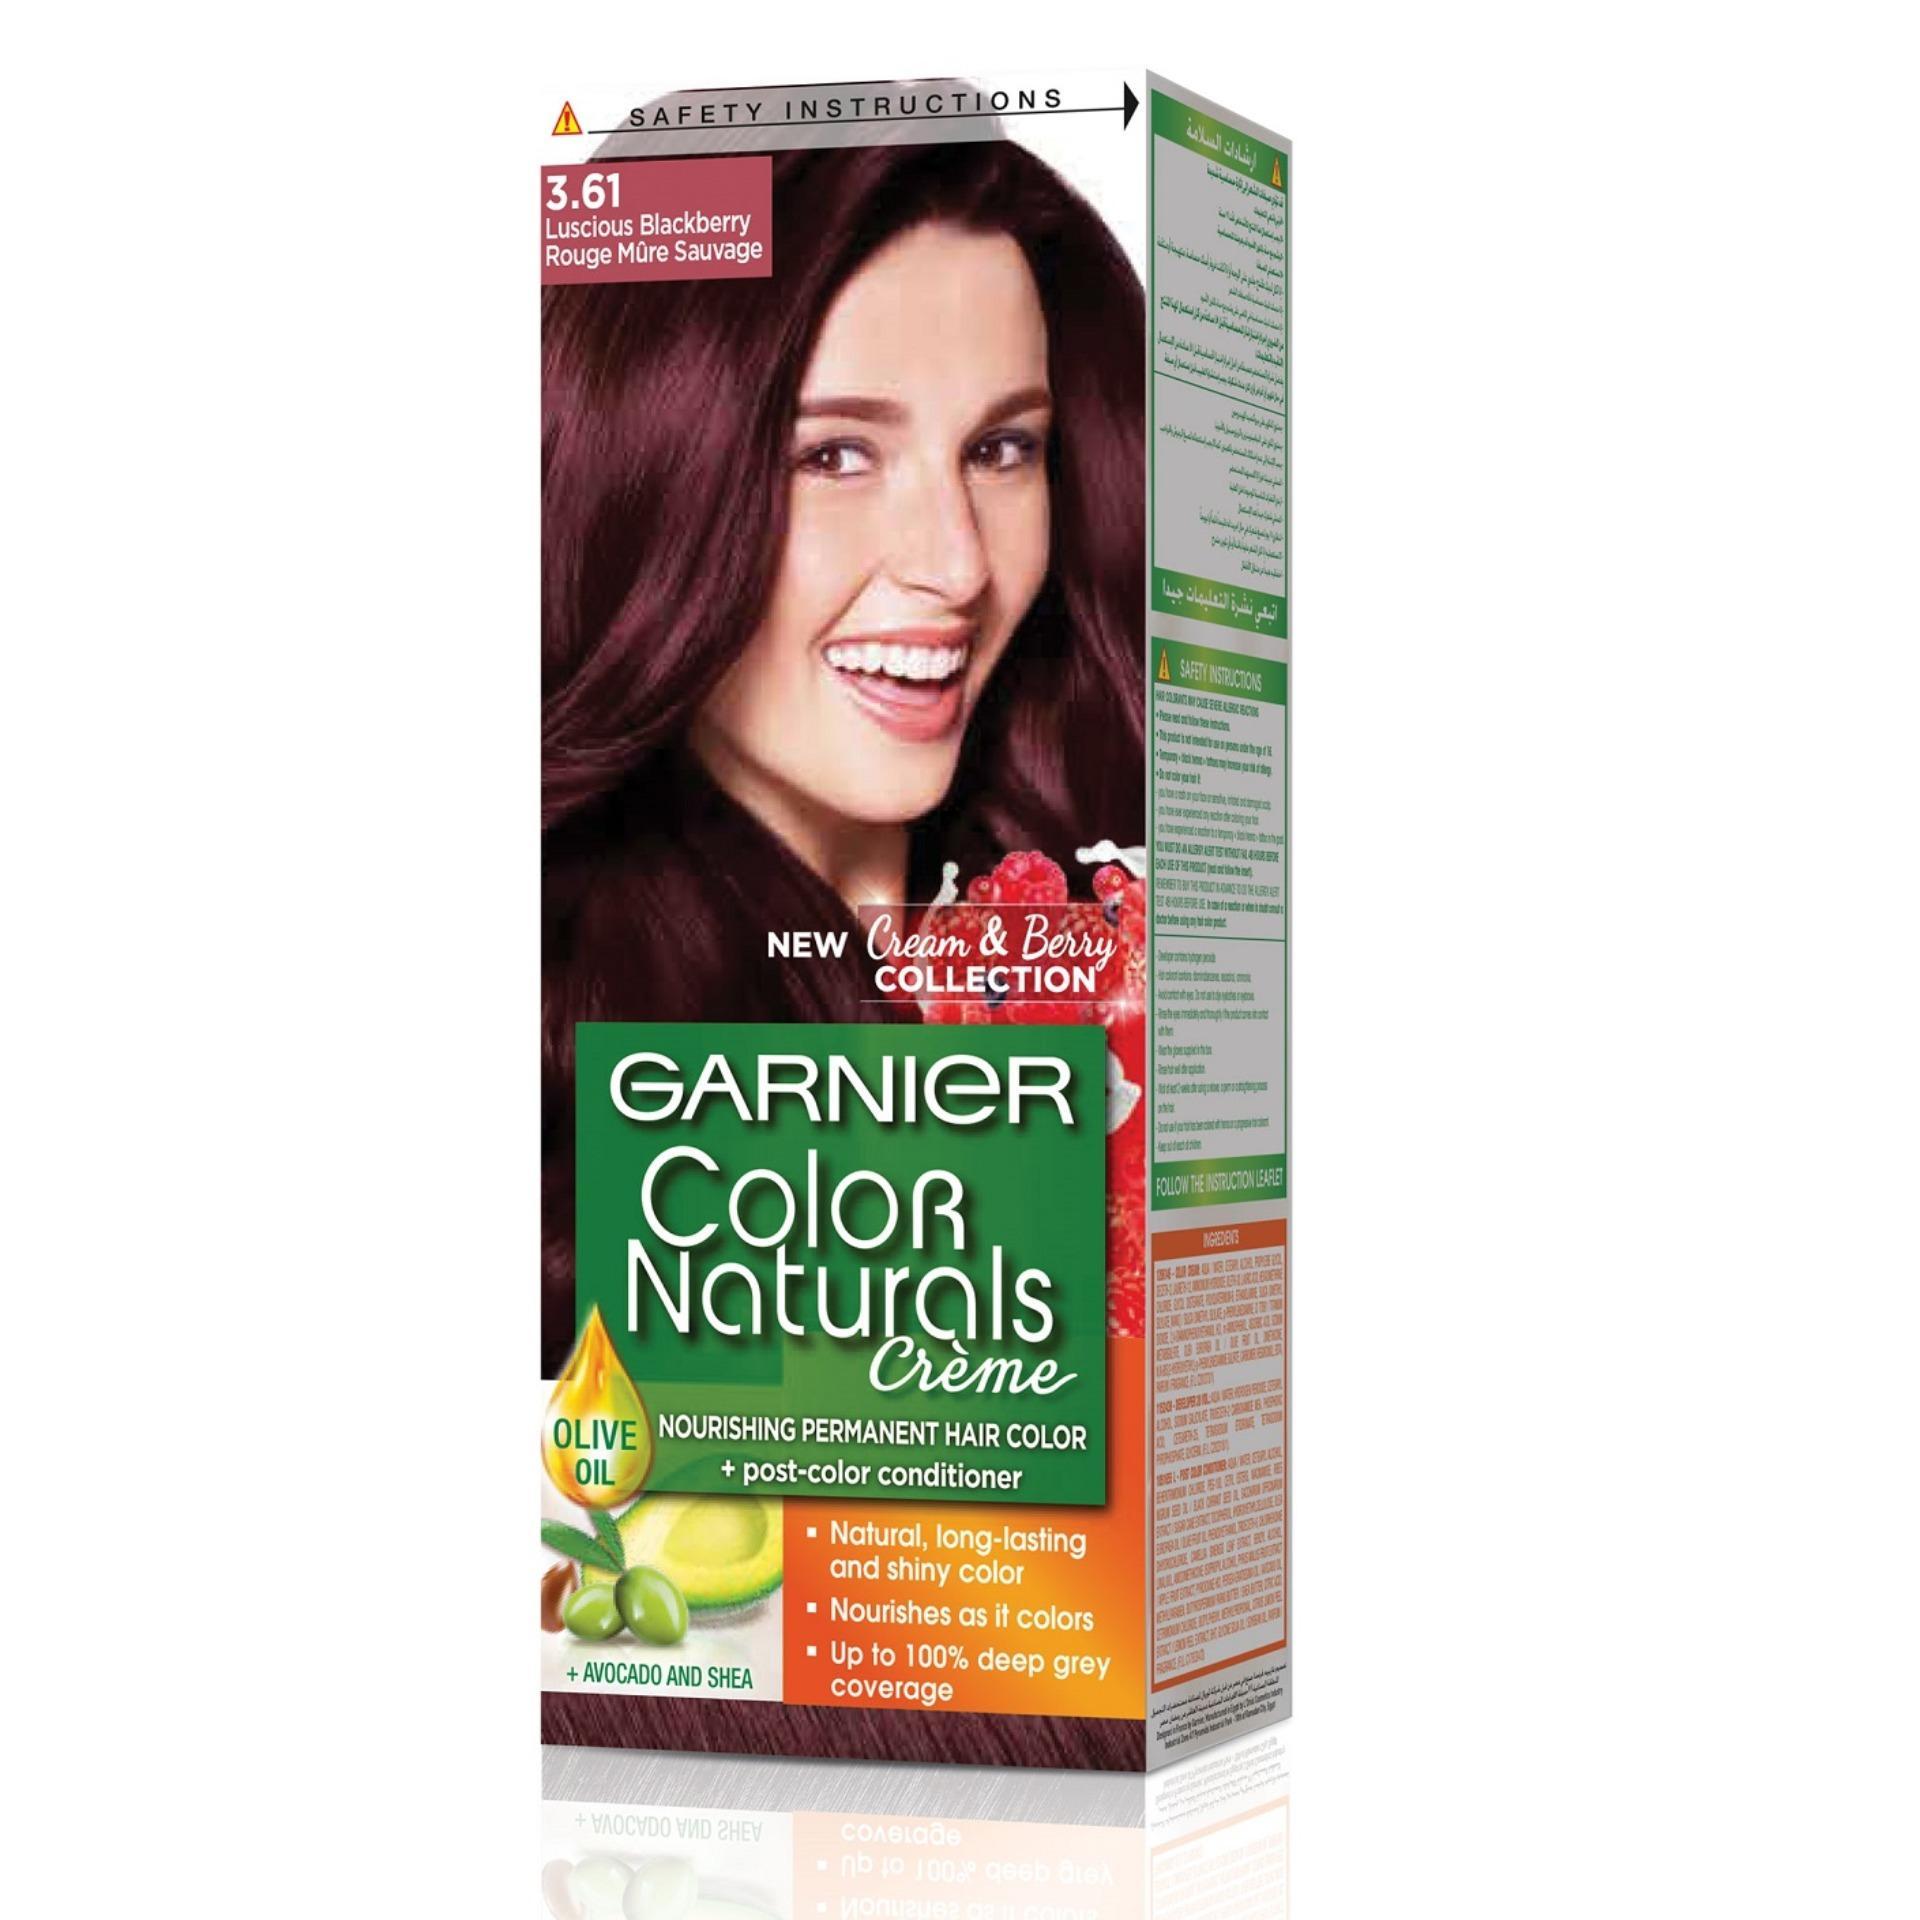 Garnier Color Naturals 3.61 Luscious Blackberry Hair Color